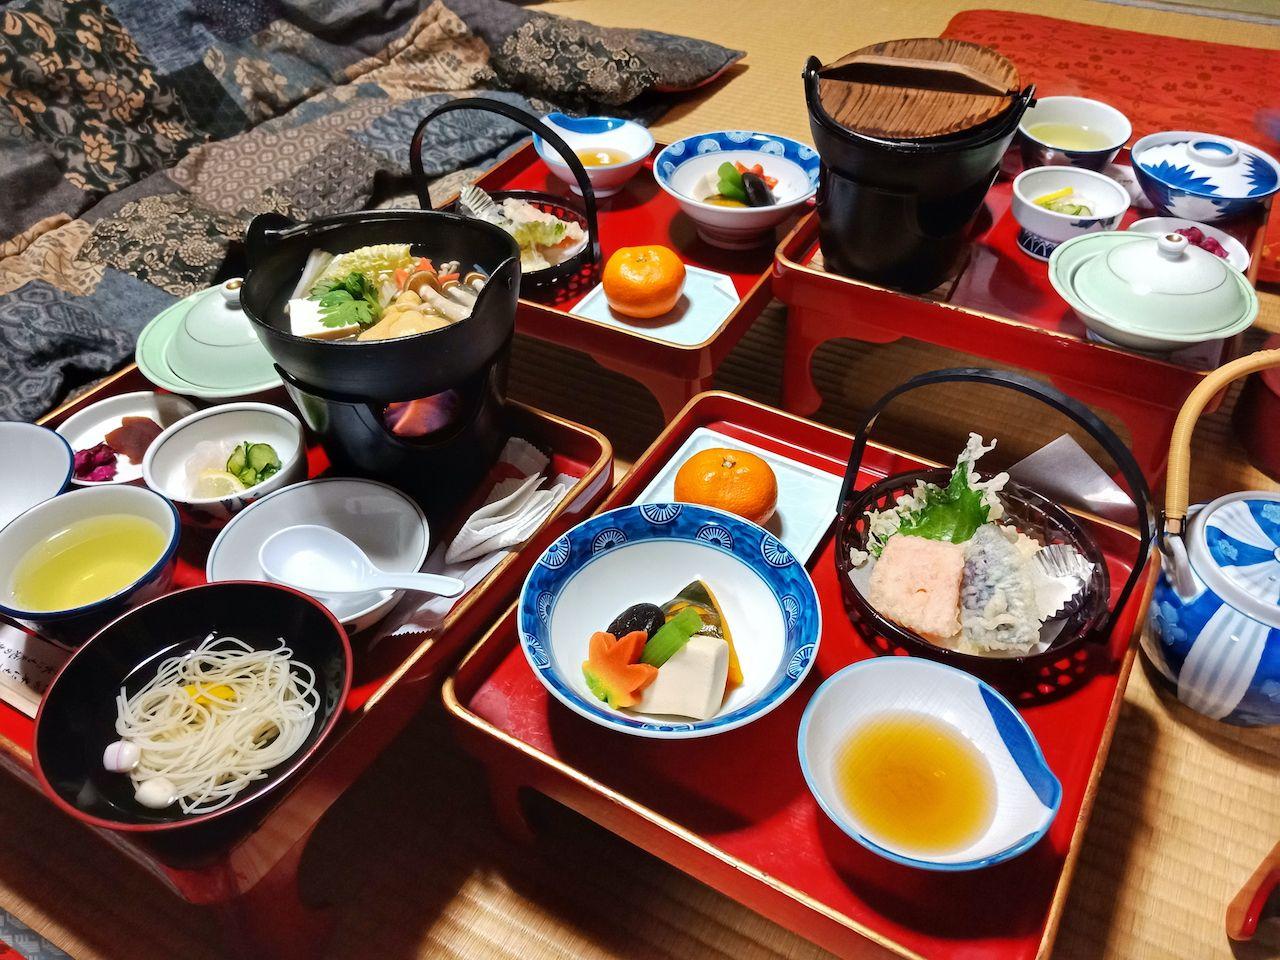 shojin ryori, apanese Buddhist cuisine